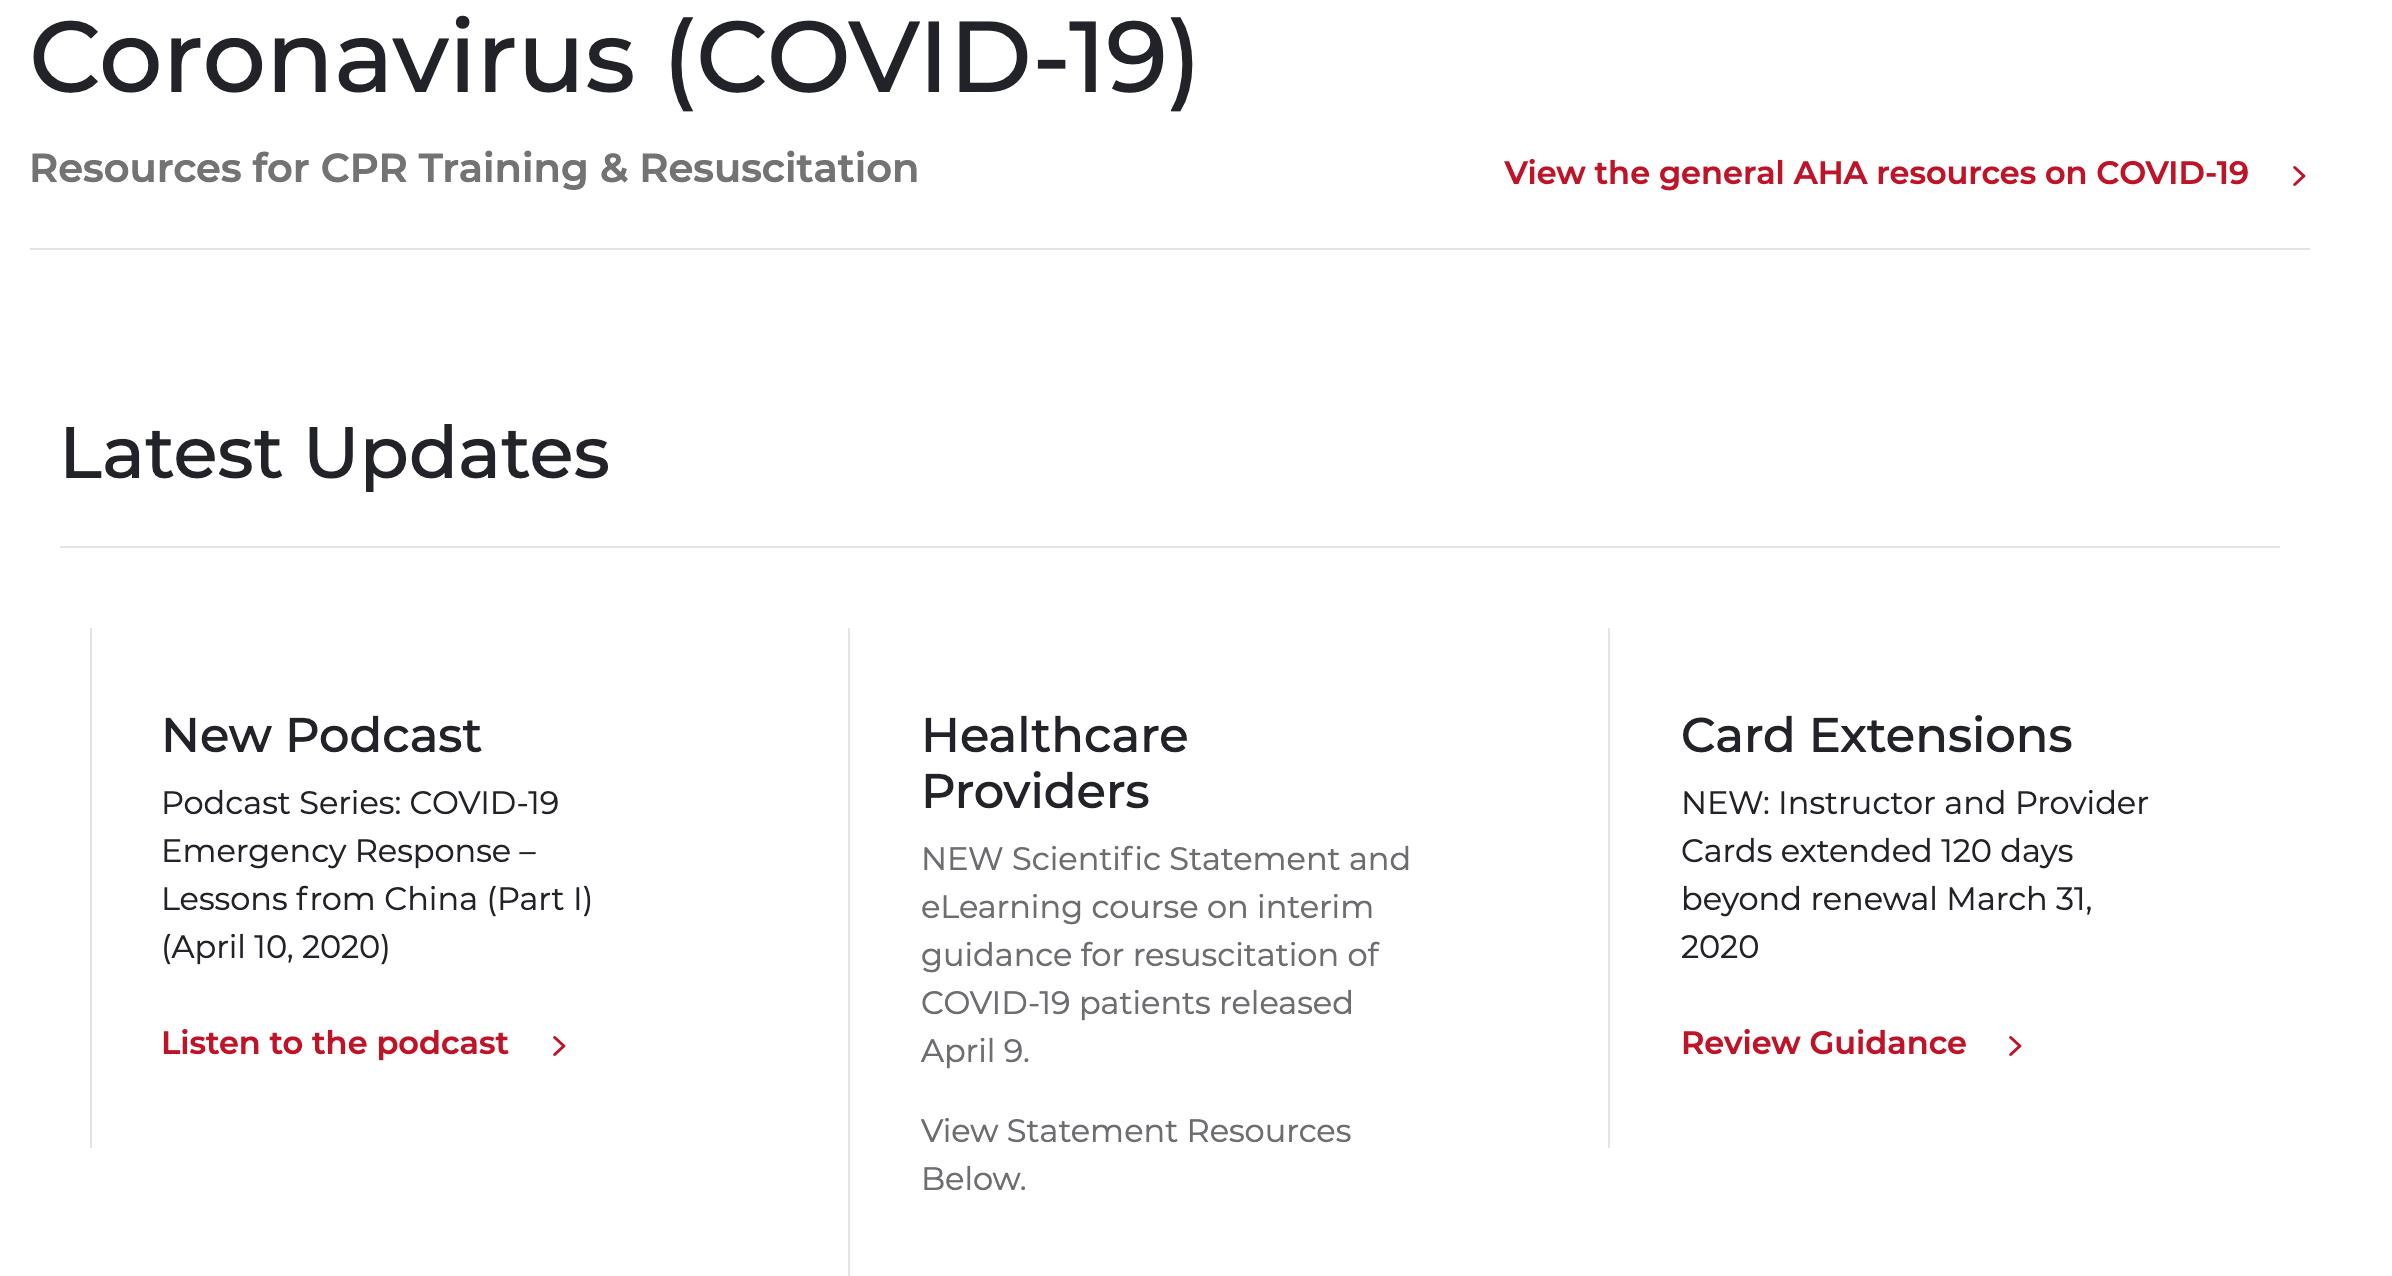 【AHA】新型コロナウイルス特設リソースサイト公開【蘇生アルゴリズム】